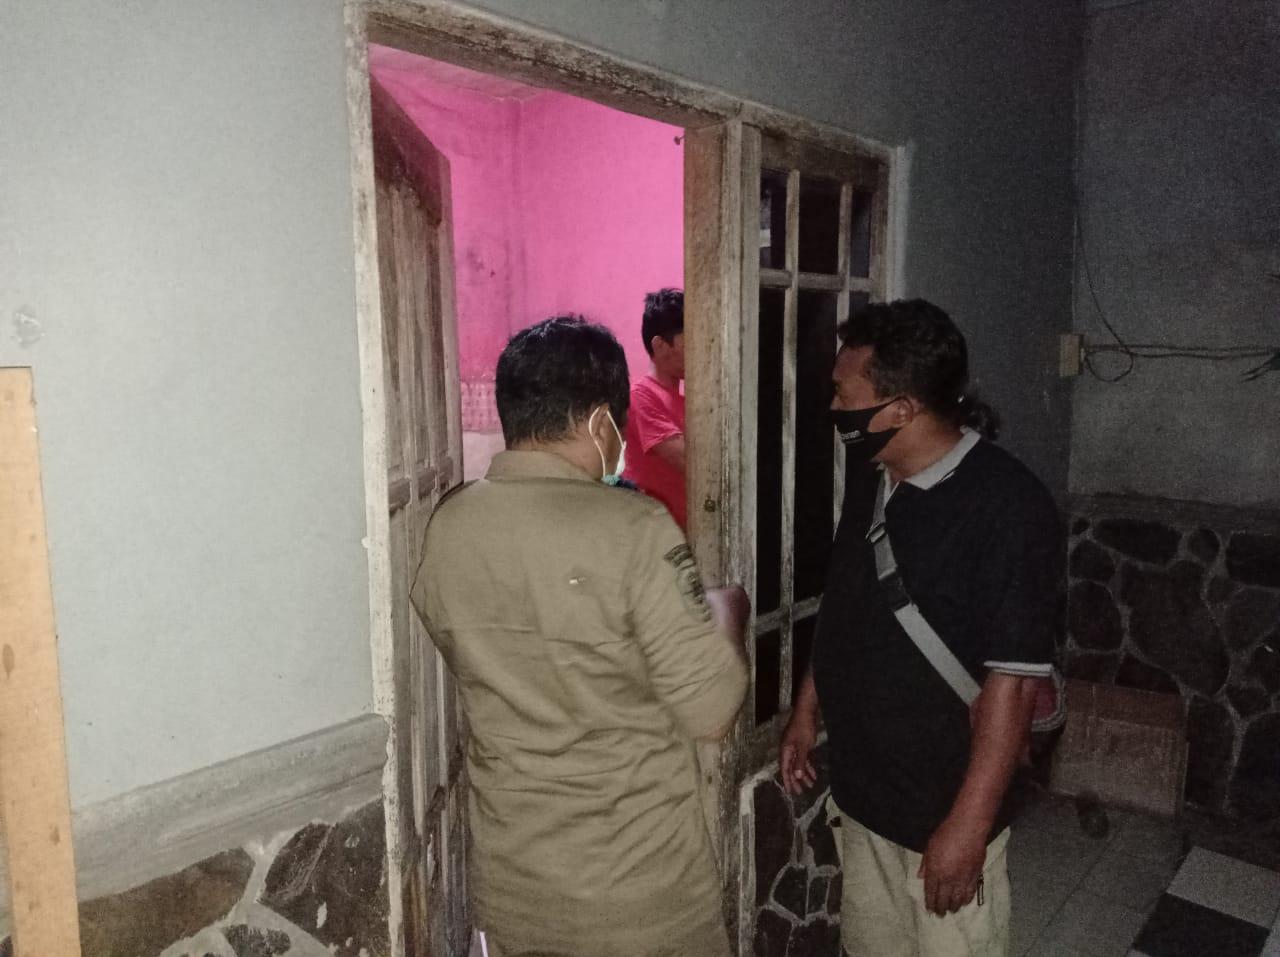 Pintu Dikunci, Muda Mudi Mesum di Kos Terciduk Satpol Kota Kediri